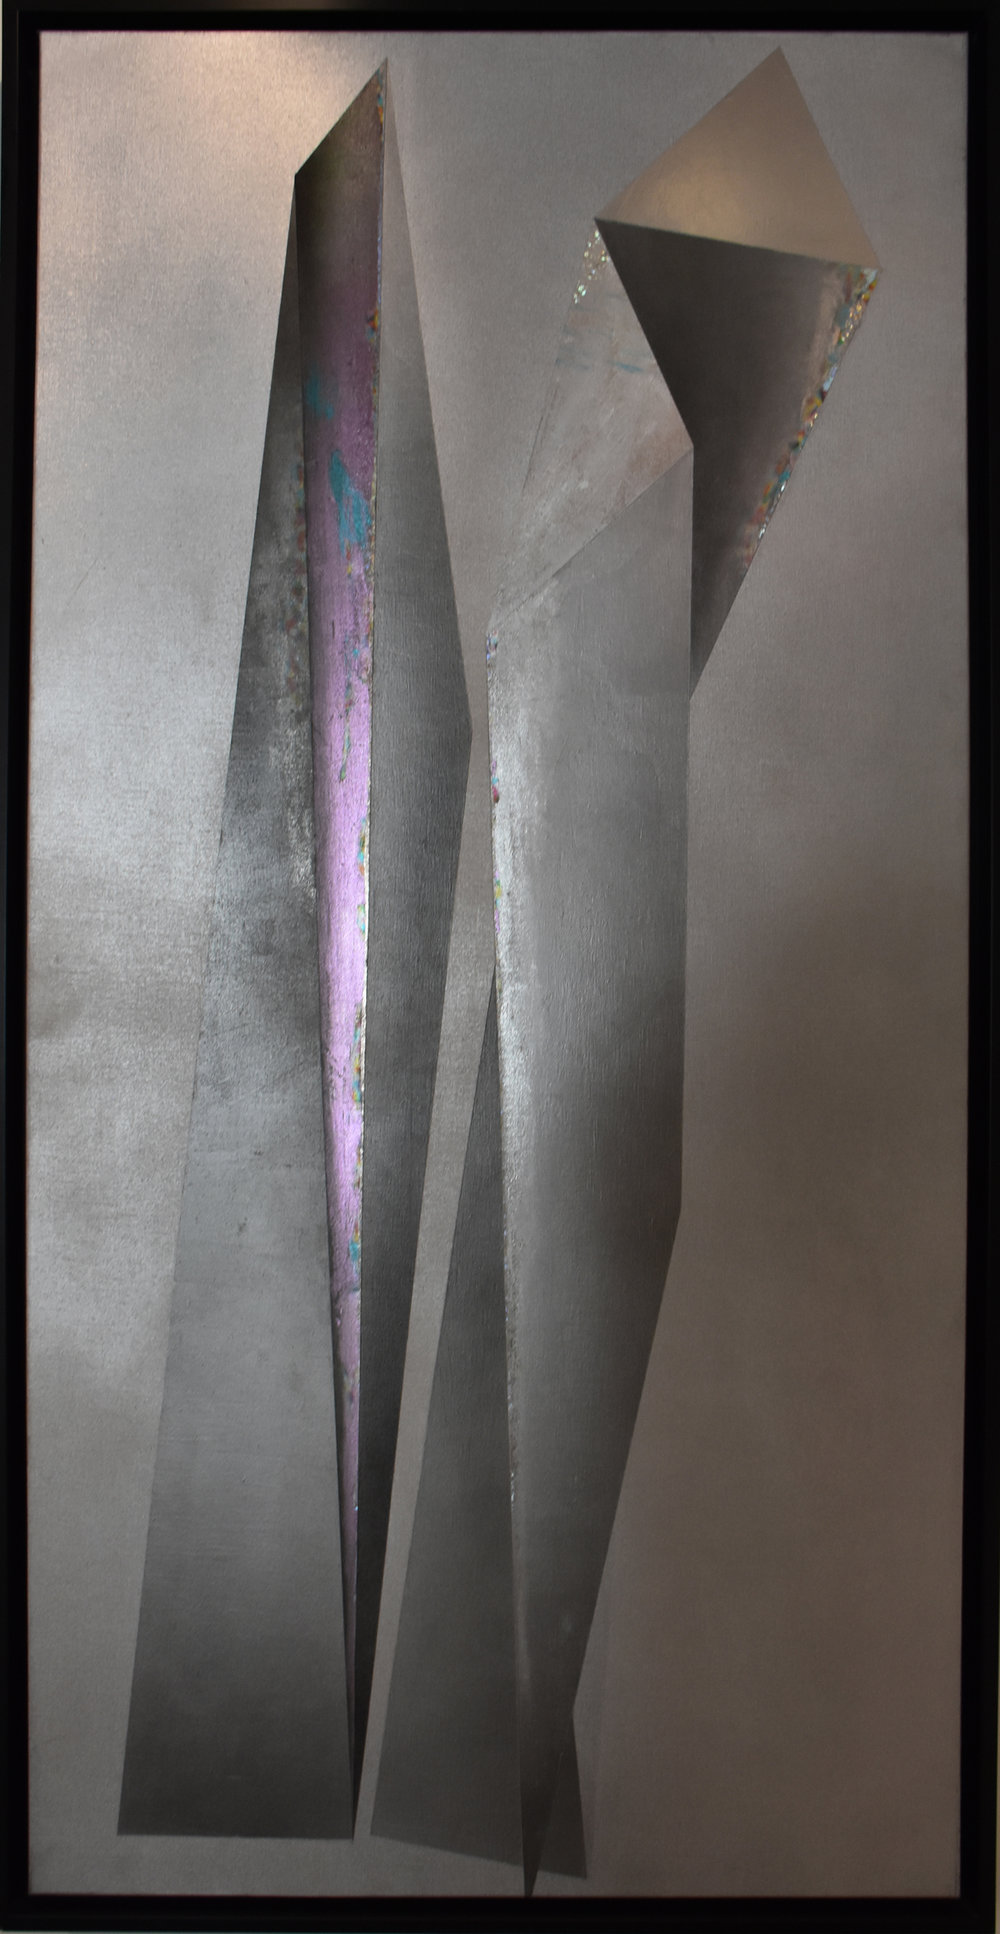 The Moonlight 2 - 2008Mixed media on canvas200 x 100 cm